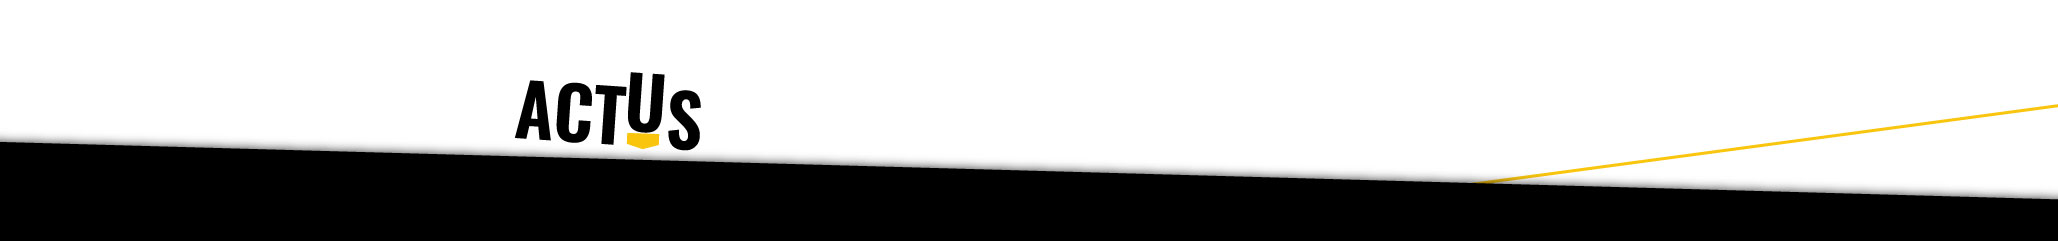 seperateur-slider-actus-white-longer